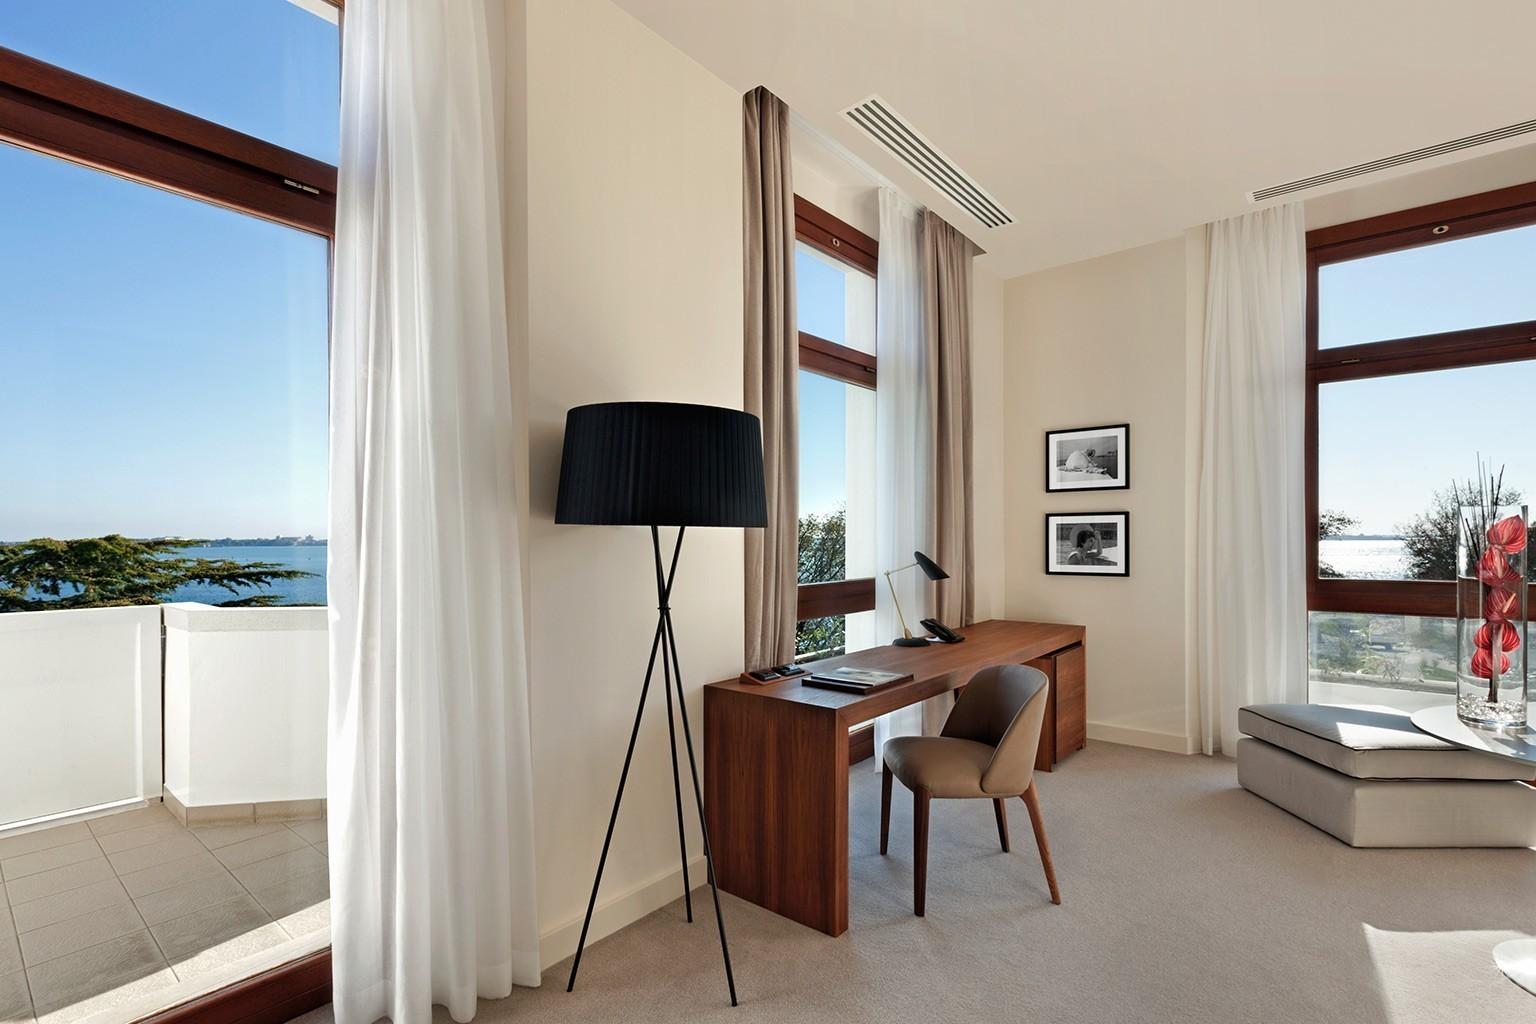 jw marriott venice resort spa designreisen. Black Bedroom Furniture Sets. Home Design Ideas